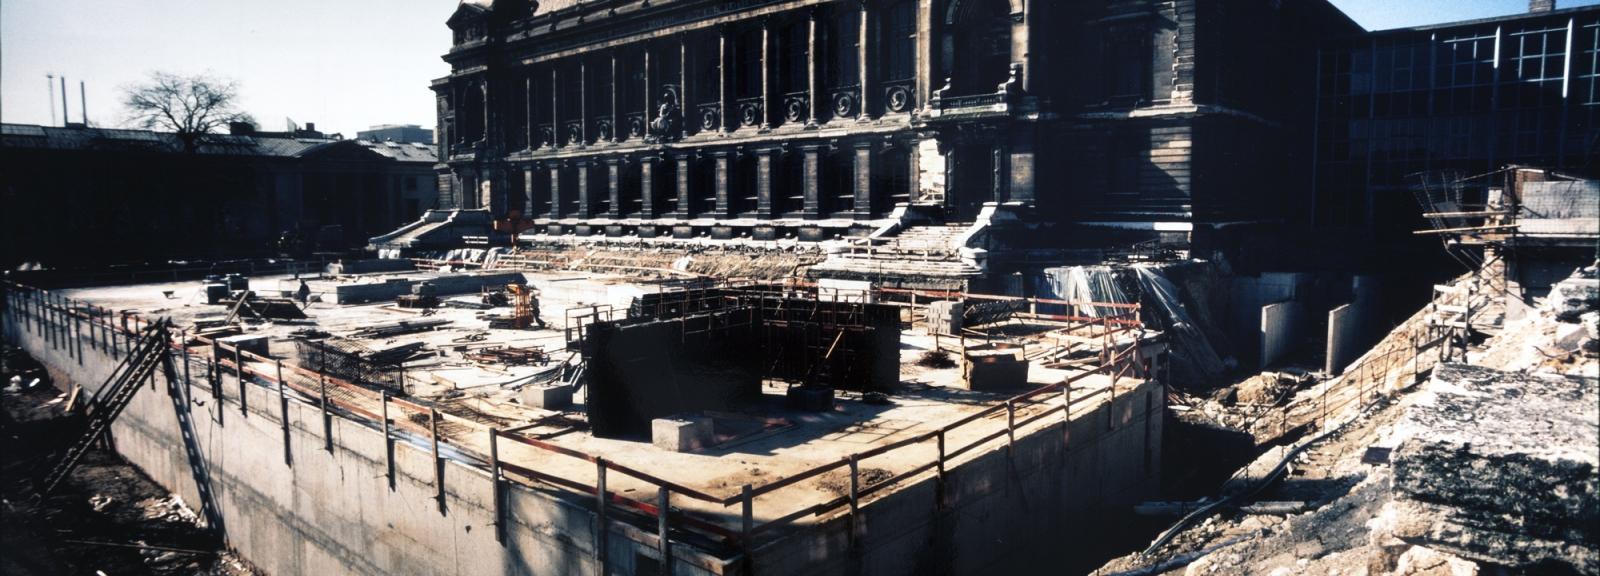 Construction de la zoothèque en 1981 © MNHN - Bernard Faye